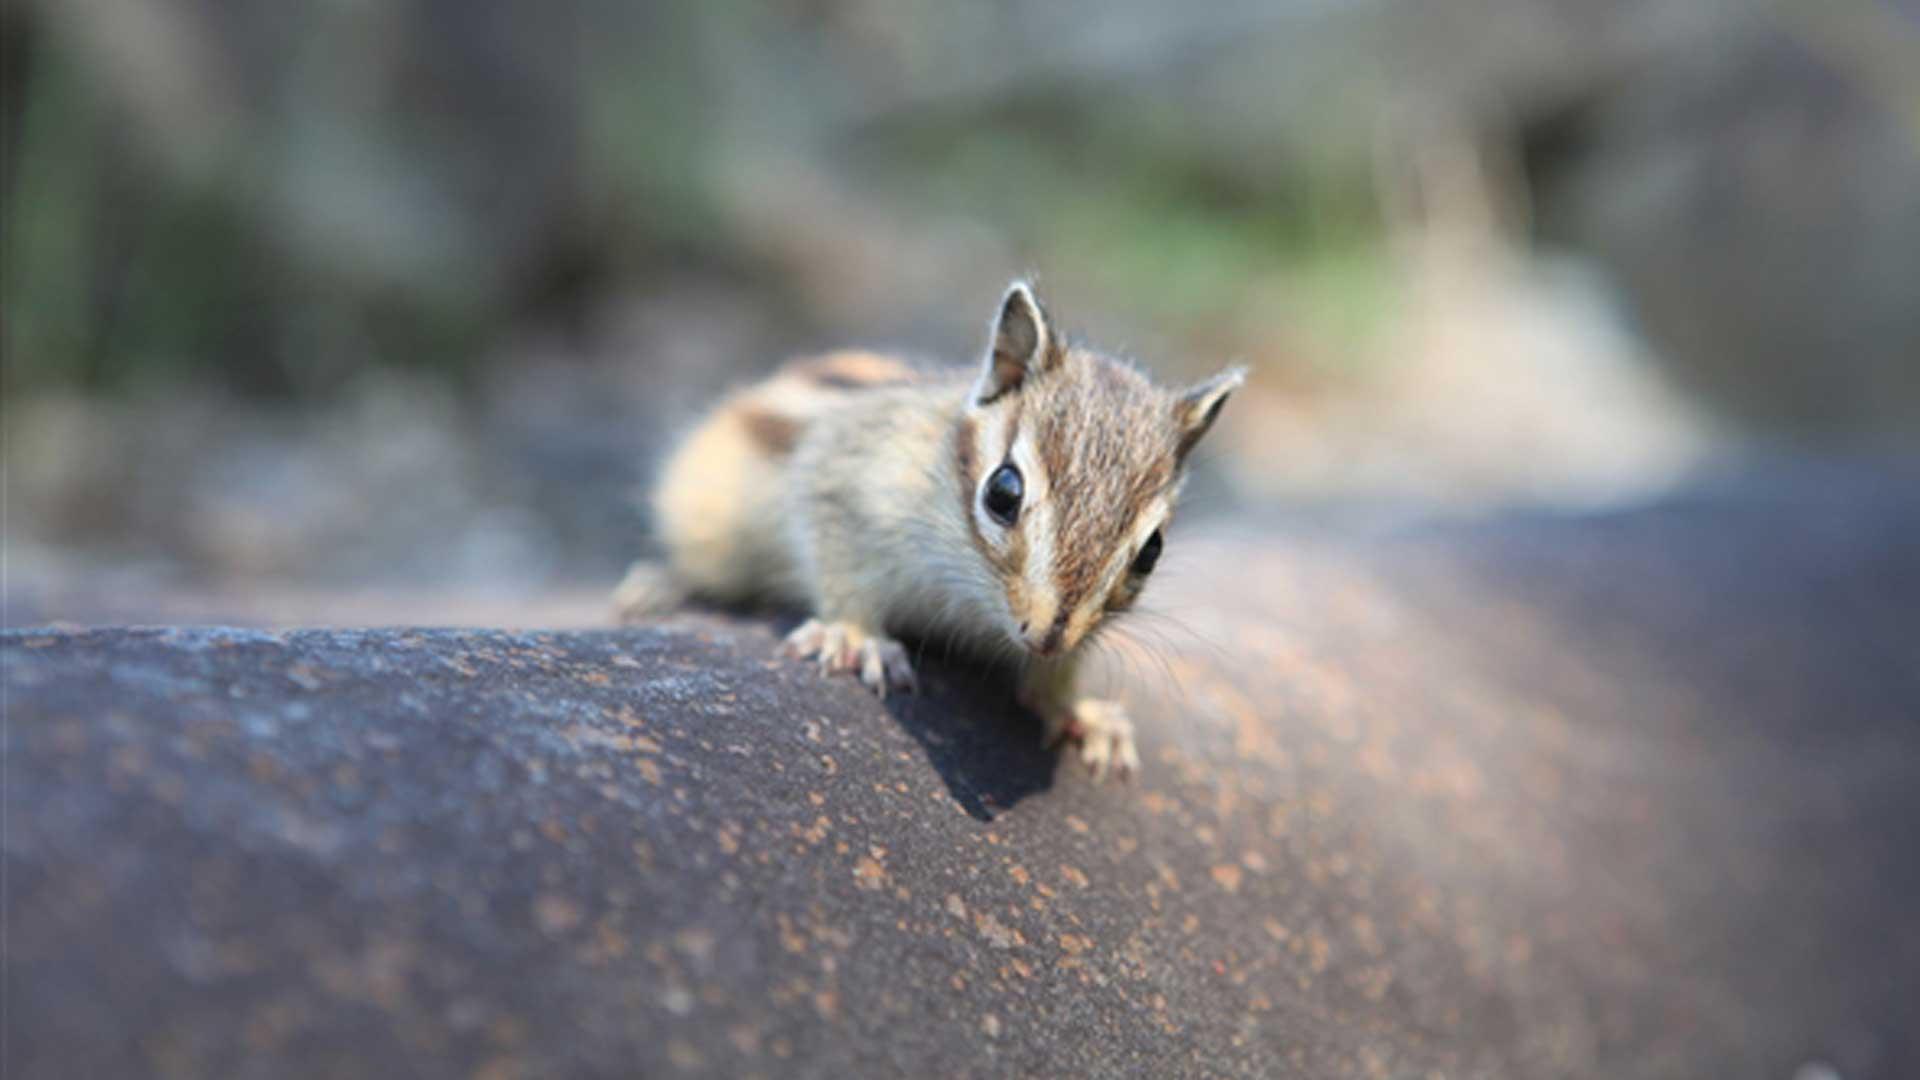 A squirrel crawls closer to a camera in Wolmyeongdong, Korea